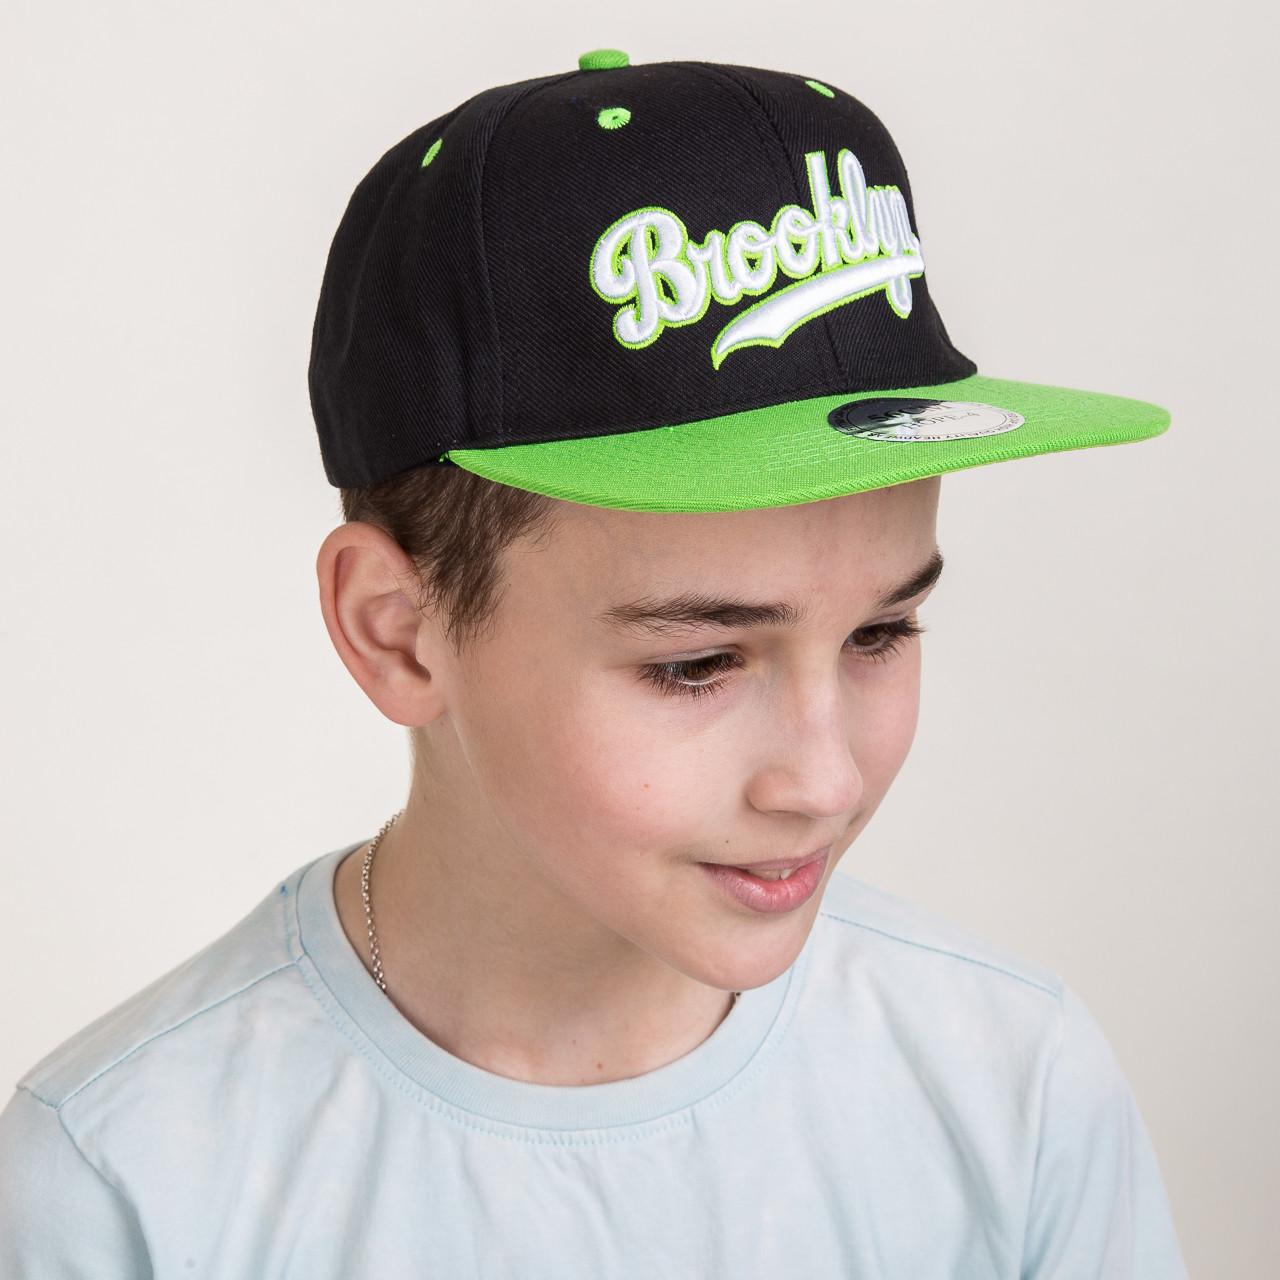 Кепка для мальчика Snapback от производителя - Brooklyn - Б09a